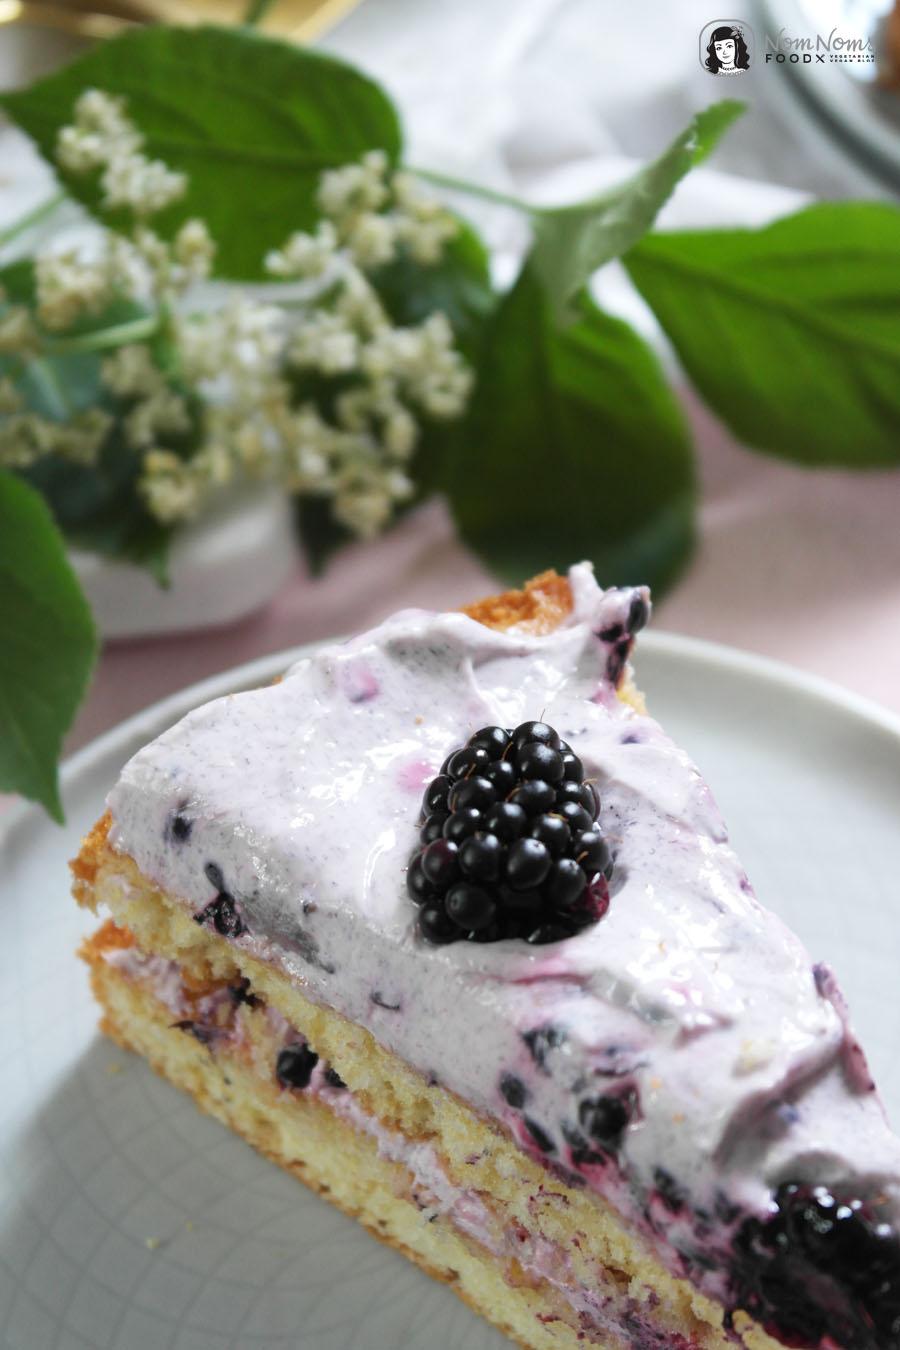 Holunderblüten-Brombeer-Kuchen